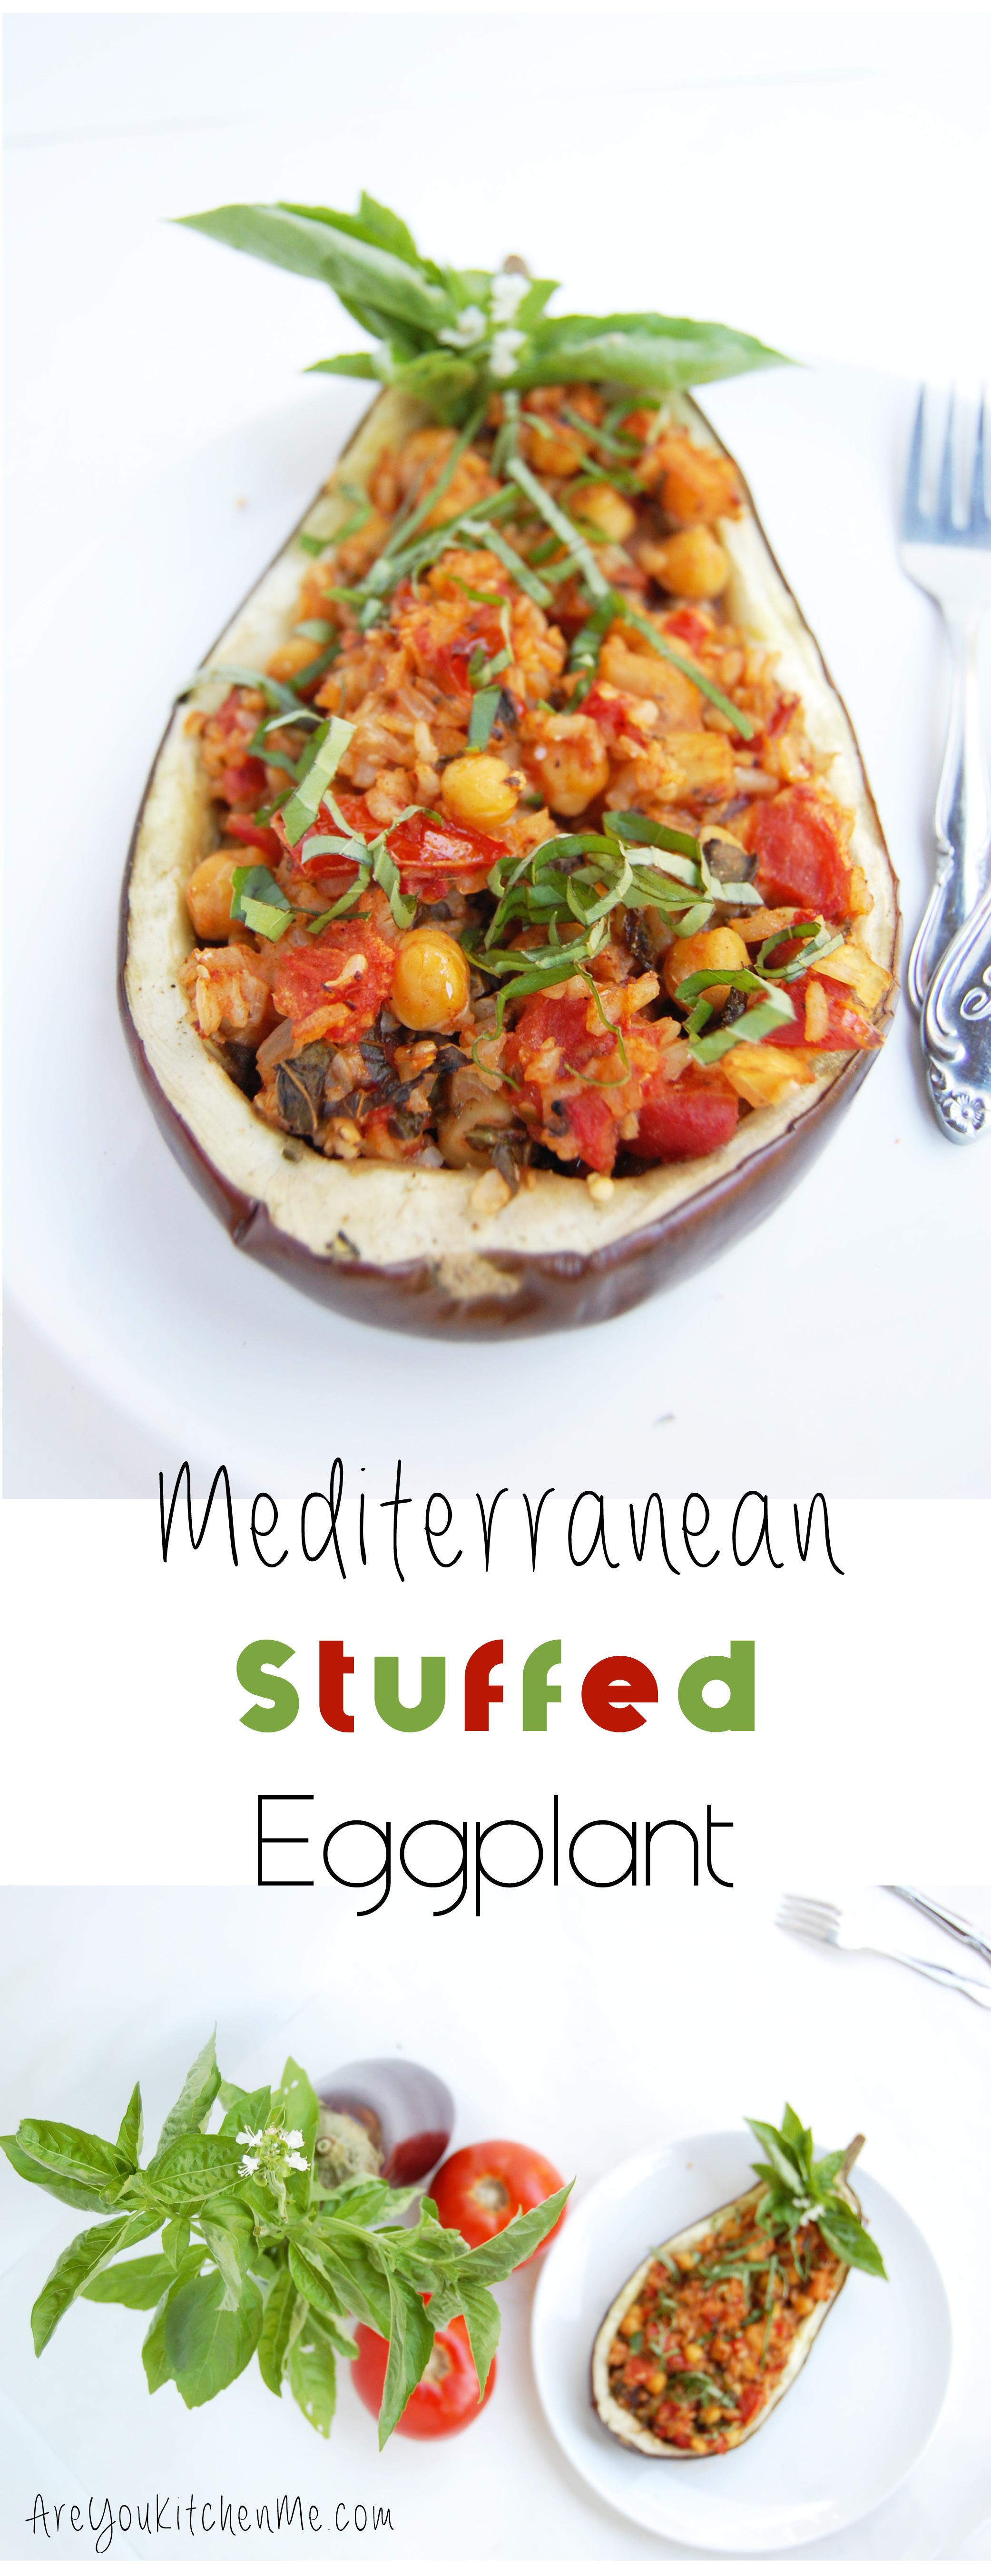 Mediterranean Stuffed Eggplant | AreYouKitchenMe.com